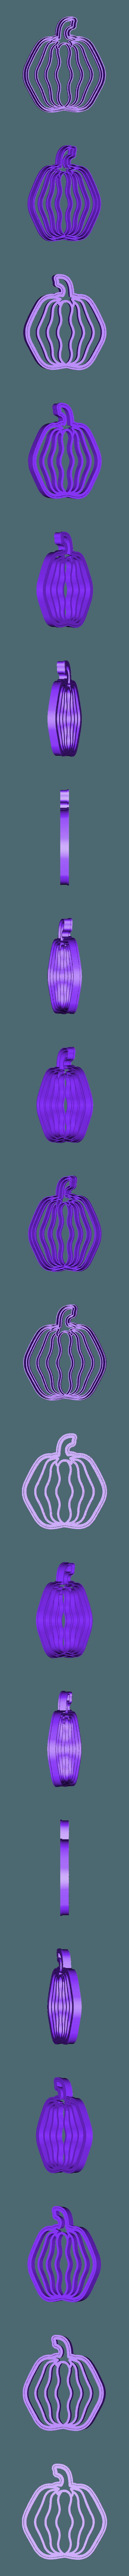 2.stl Télécharger fichier STL gratuit PACK CHAUSSURES ET CHAUSSURES - SCEAUX ECHANGEABLES - CHAUSSURES HALLOWEEN CUTTING - FONDANT MASS CUTTING AND pumpkin CLAY - 8 AND 10cm • Objet imprimable en 3D, Agos3D